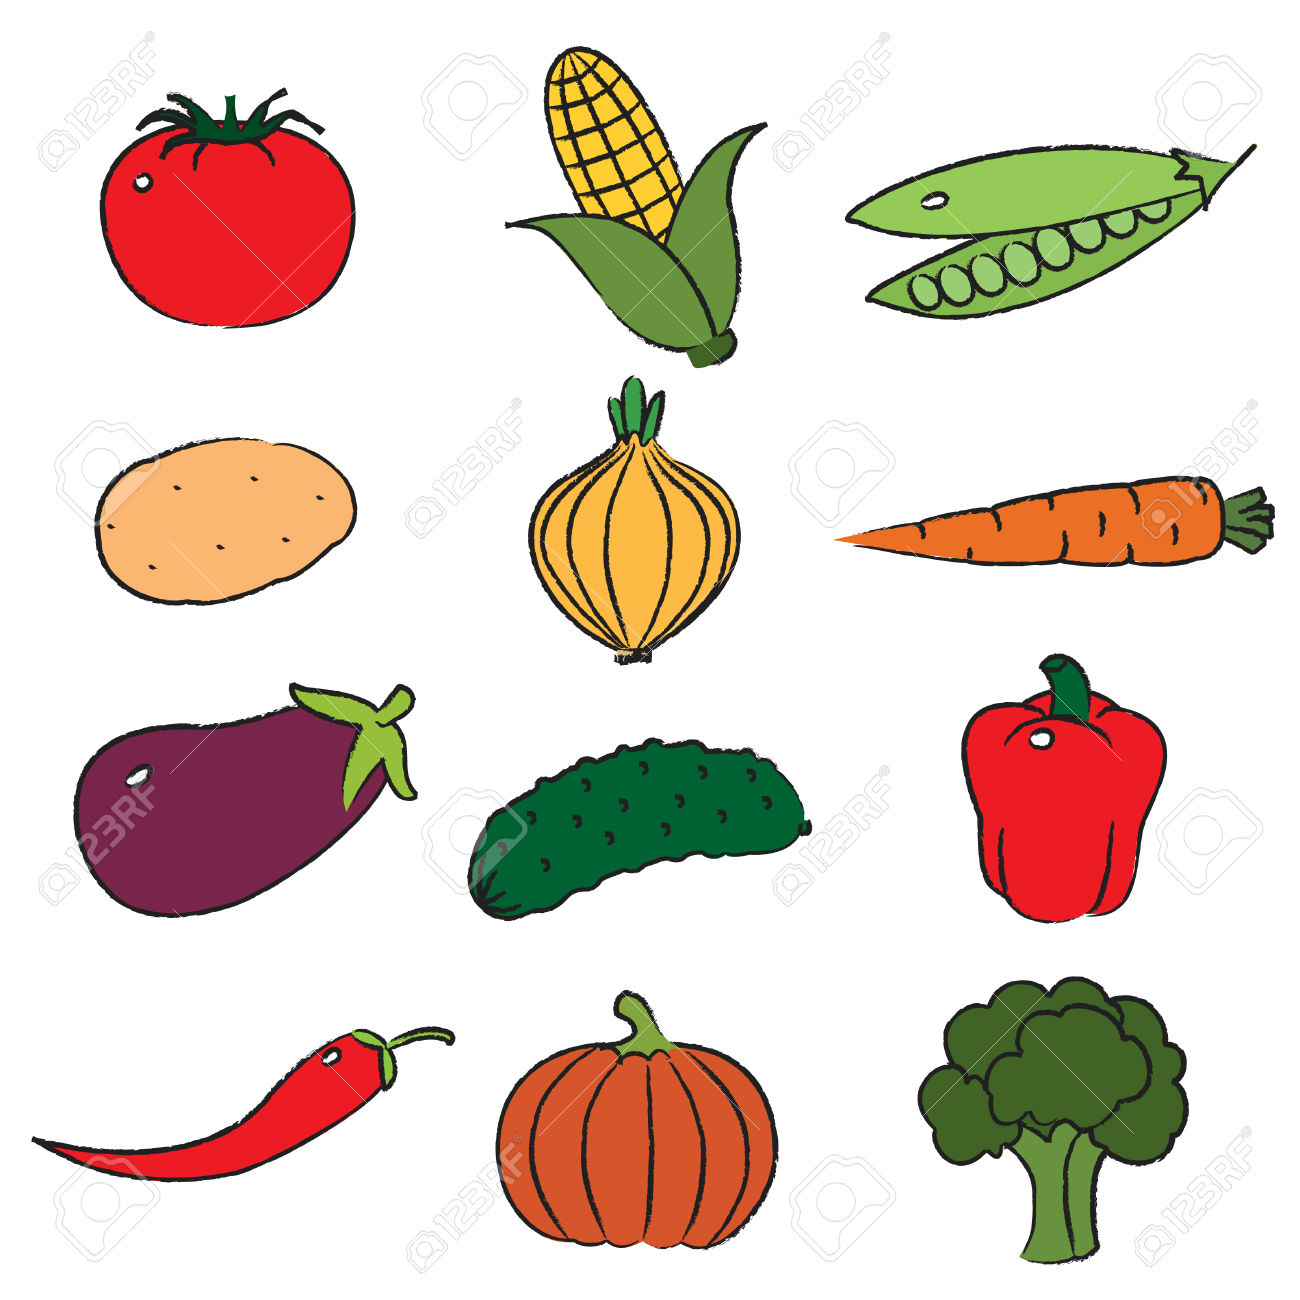 vegetables clip art #7